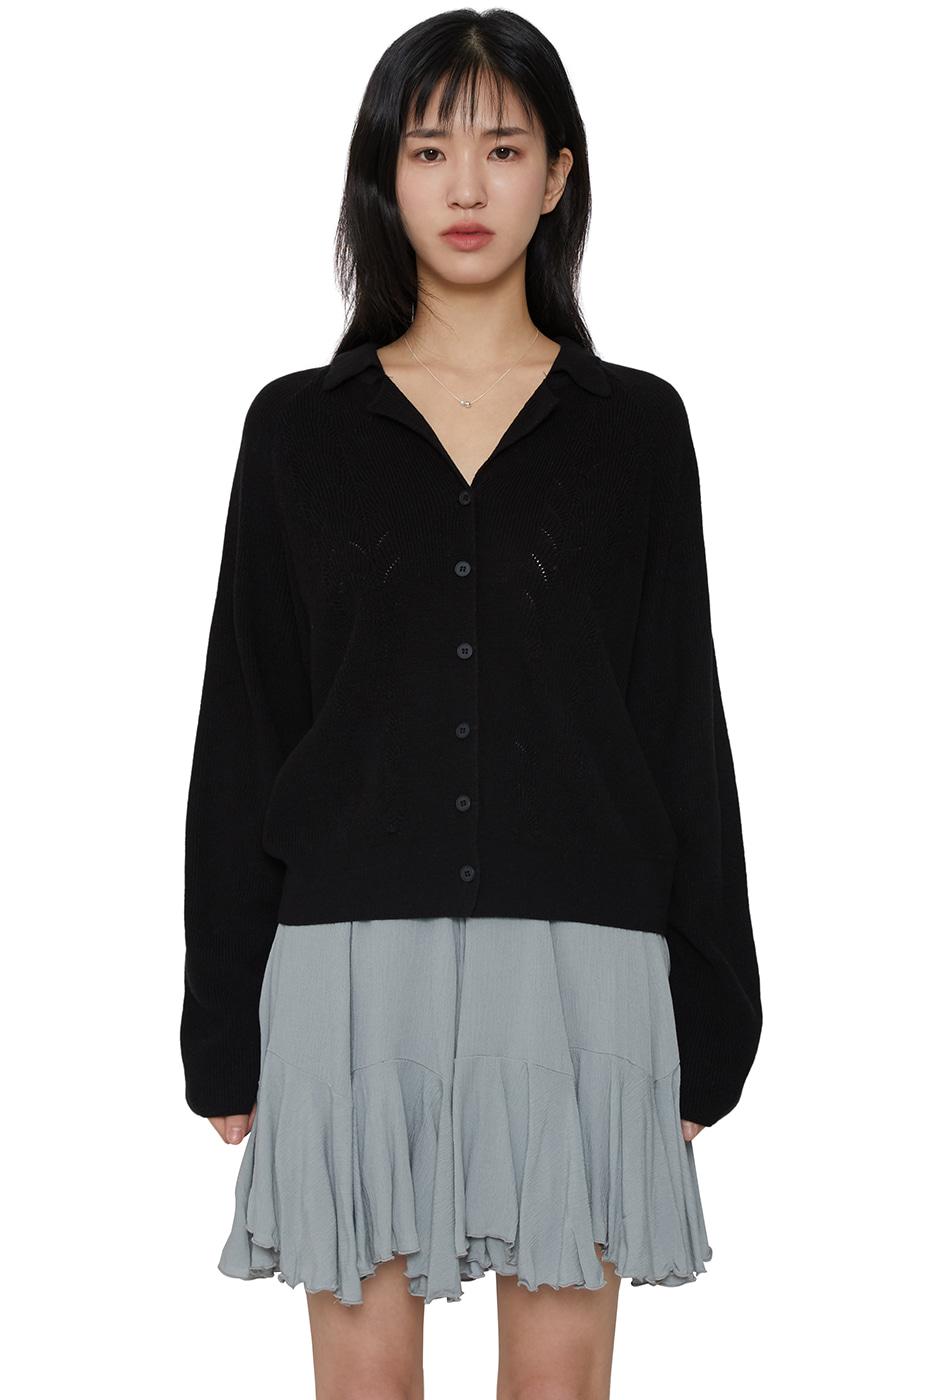 Spring Open Collar Knitwear Cardigan